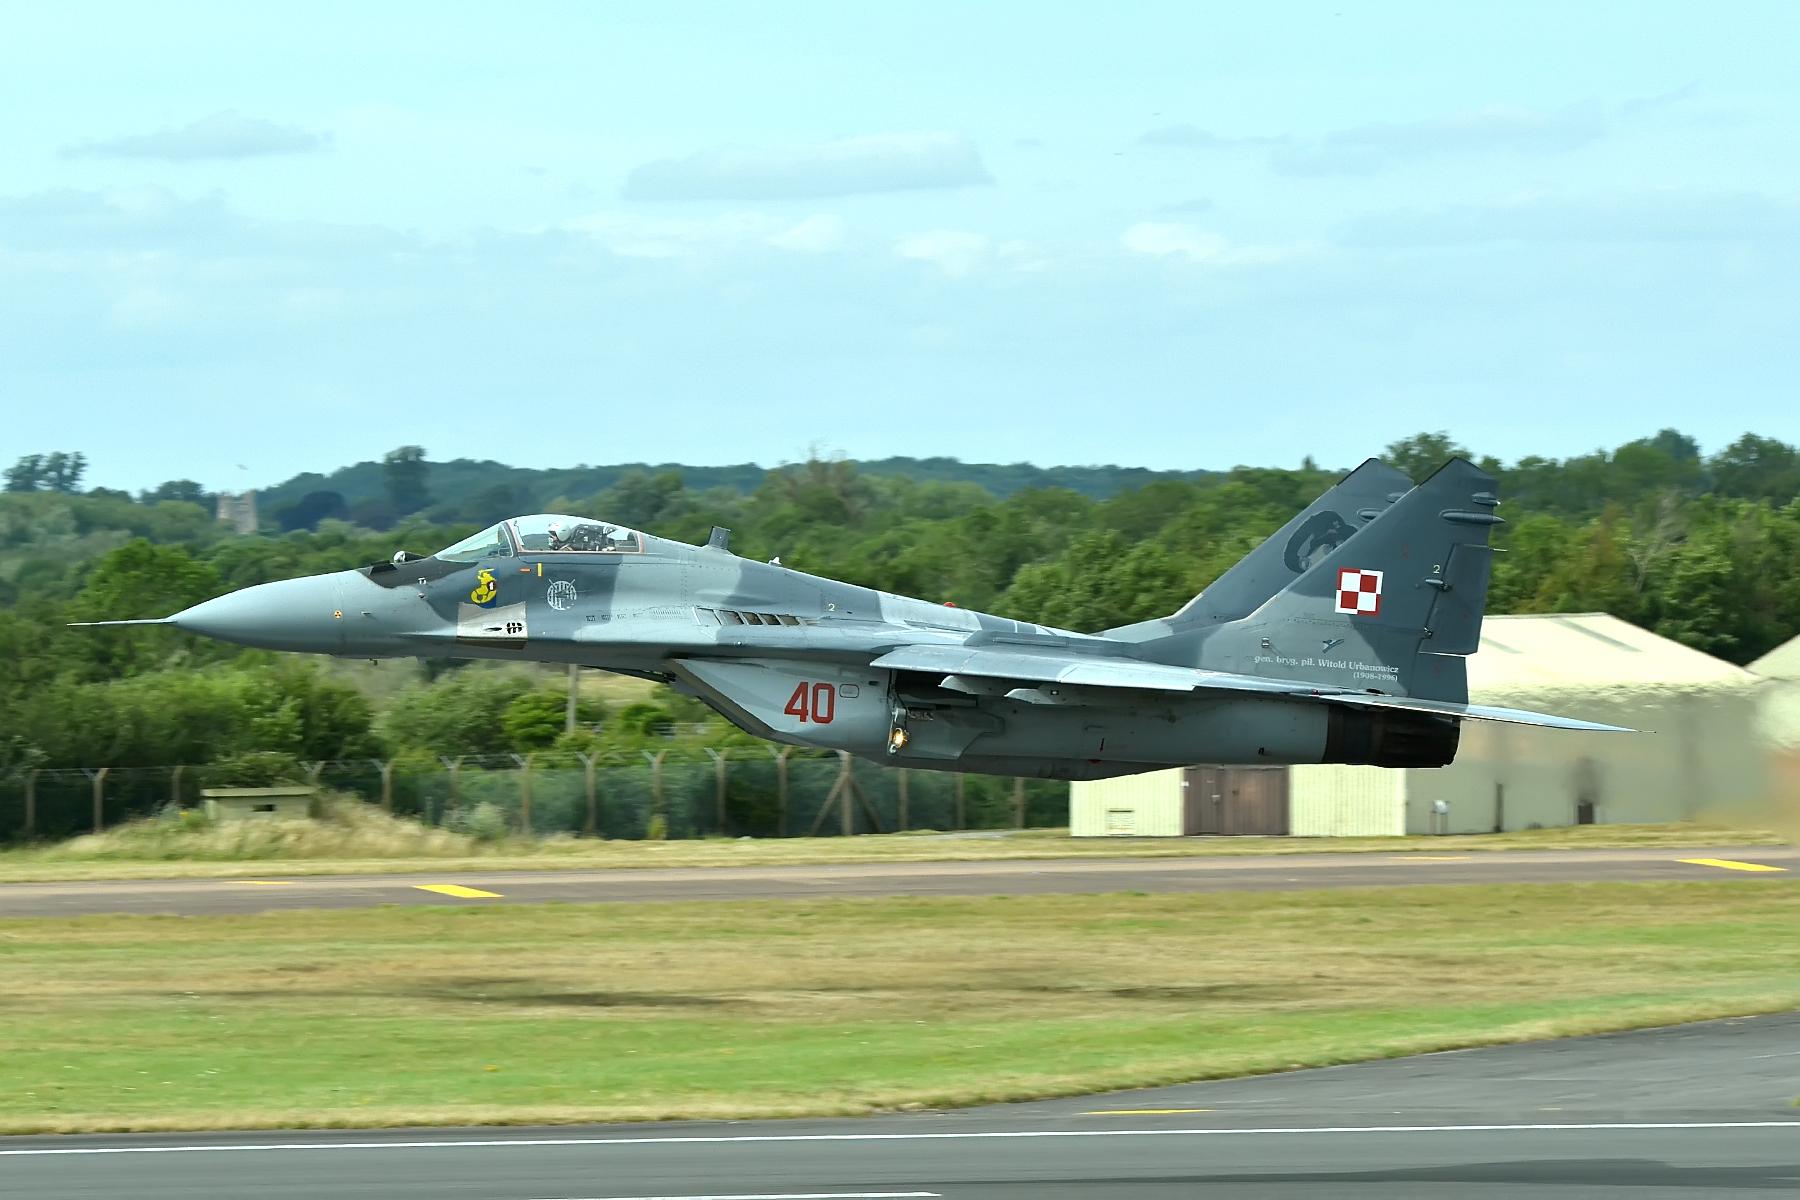 File:40 Mig-29 Polish Air Force - RIAT 15 (19861339062).jpg - Wikimedia Commons